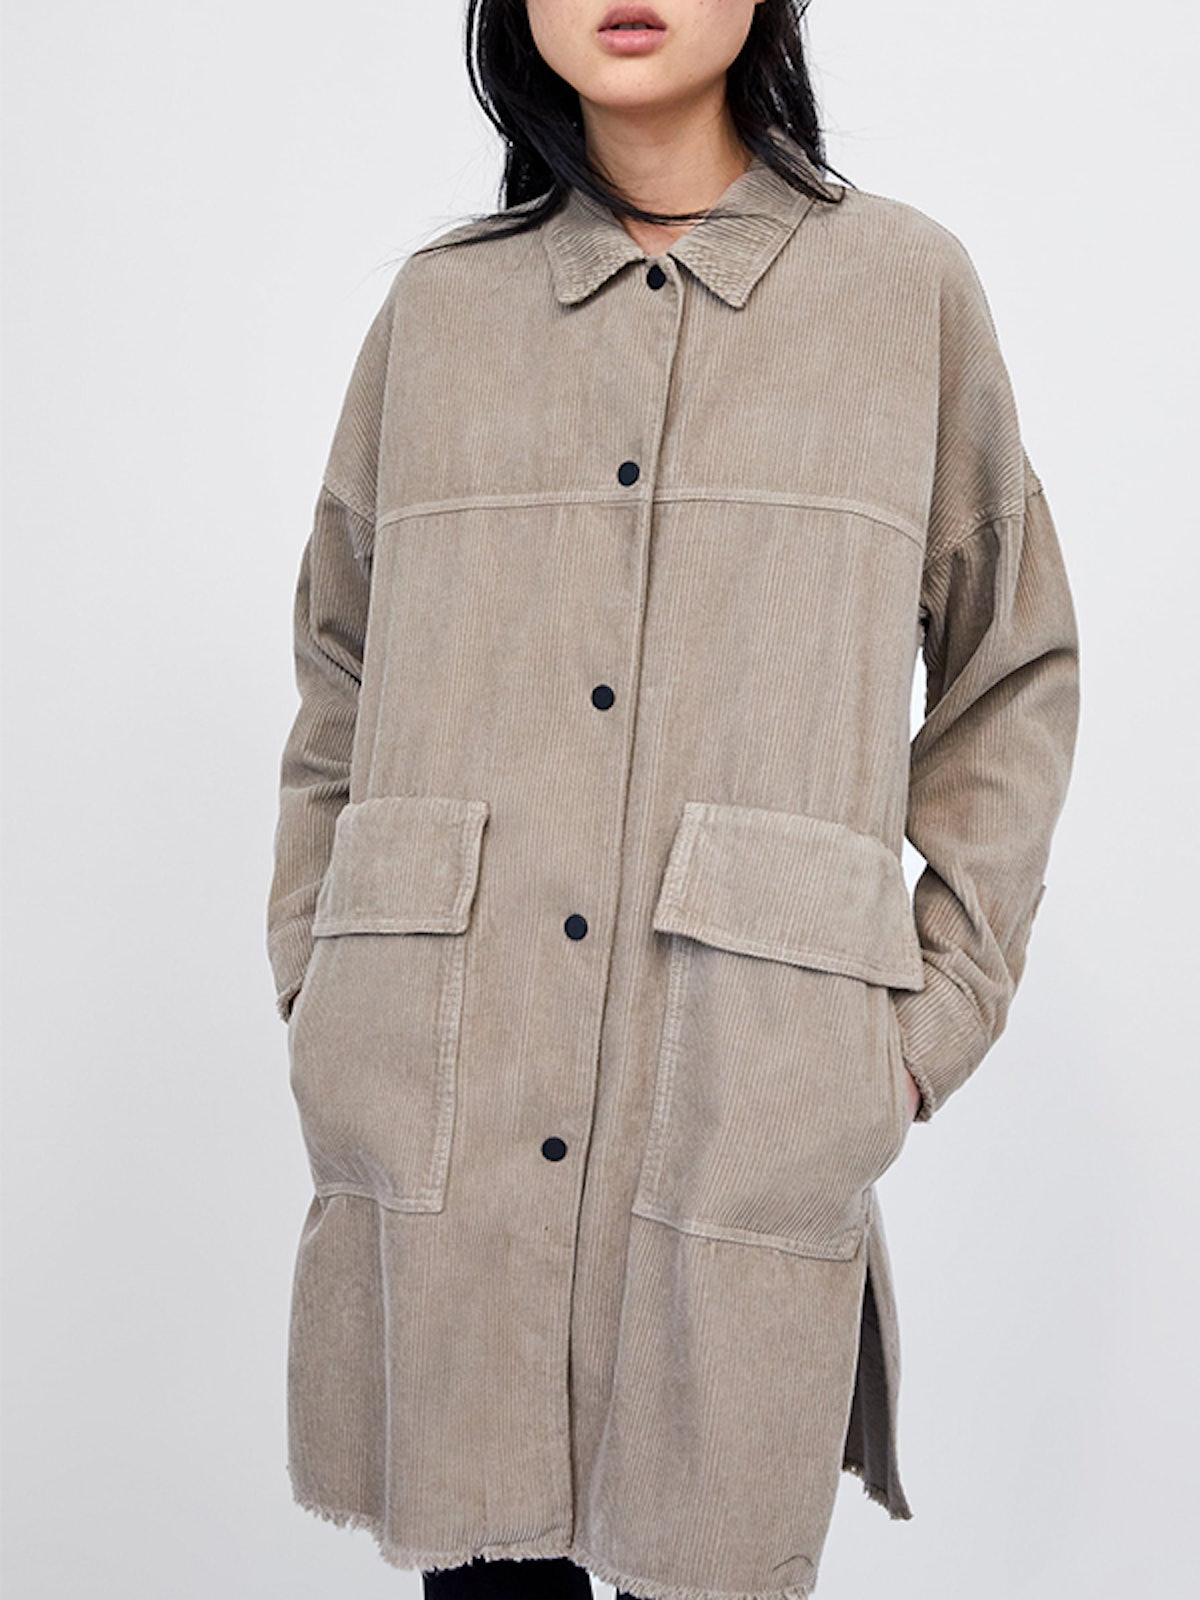 Corduroy Overshirt With Pockets